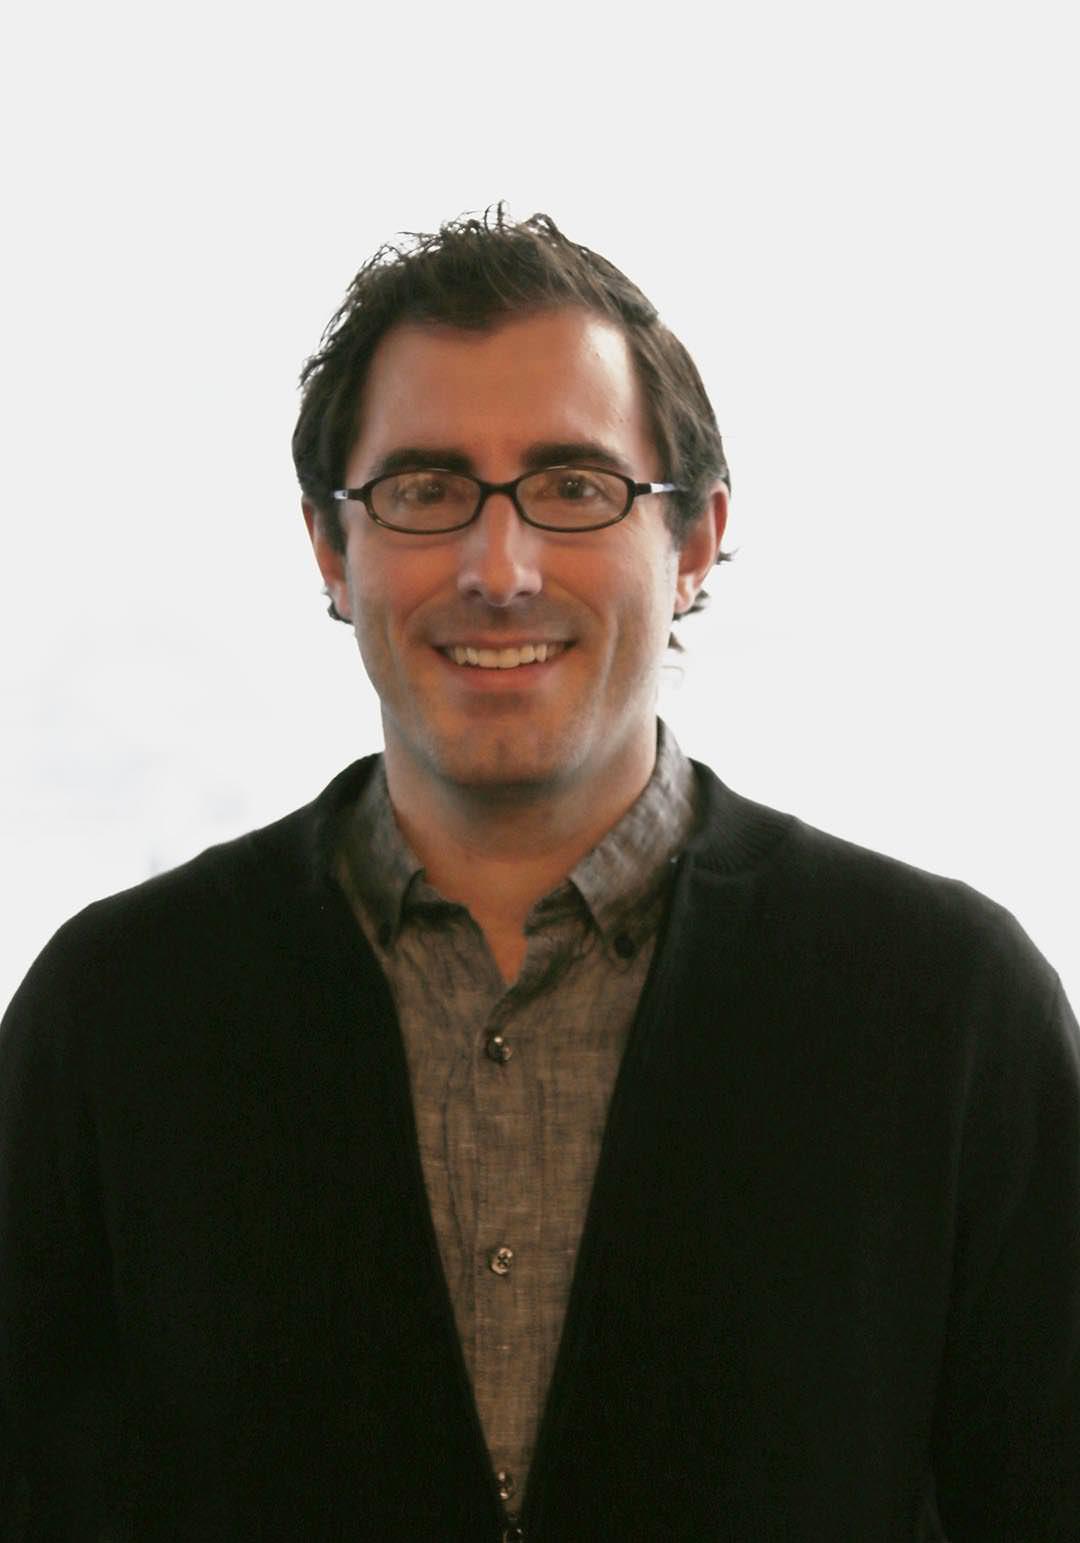 Jon Hoefer